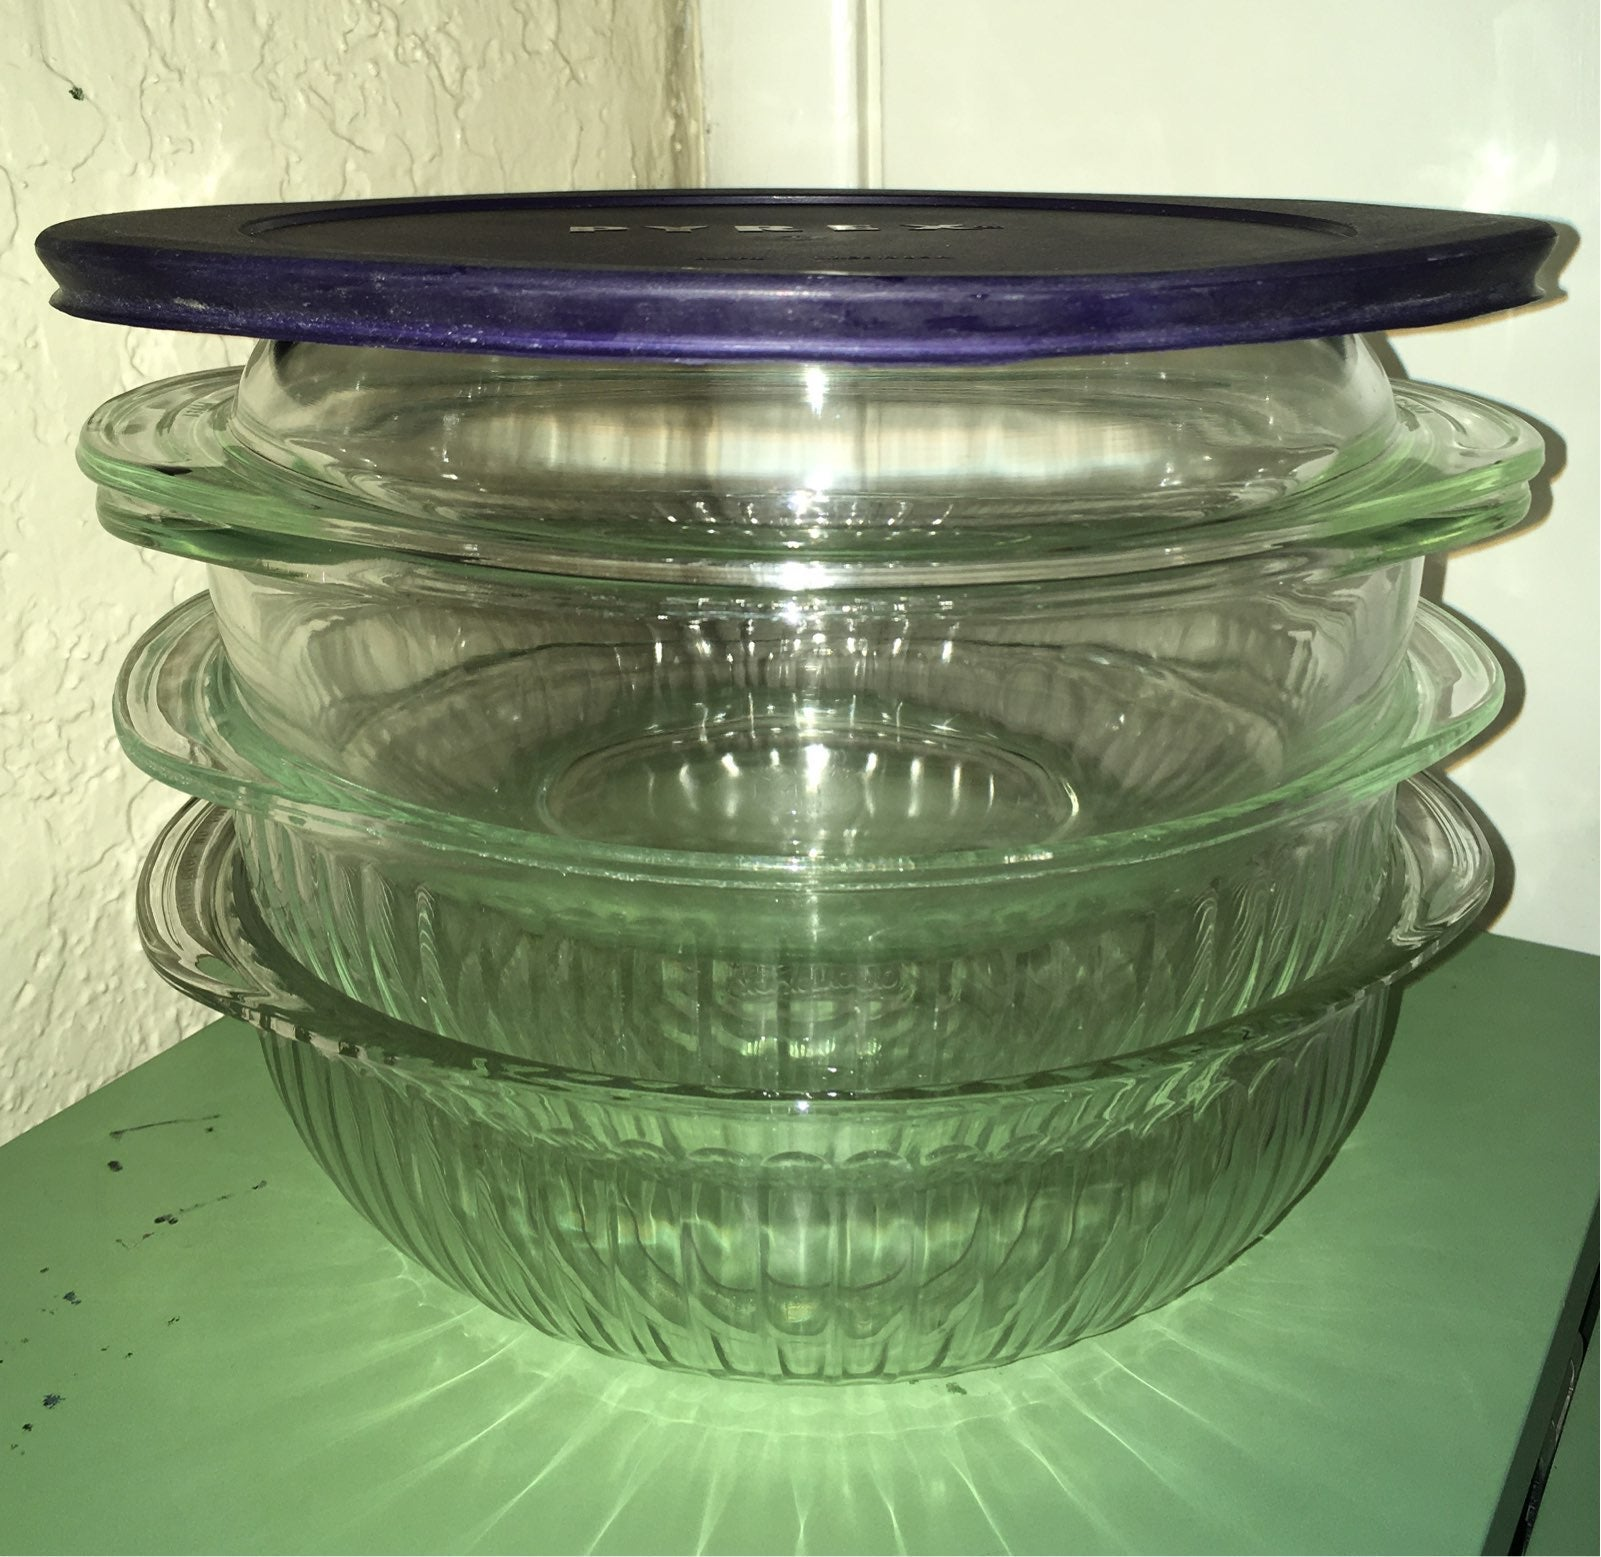 3 Pyrex 2 qt Oval Glass Casseroles + Lid